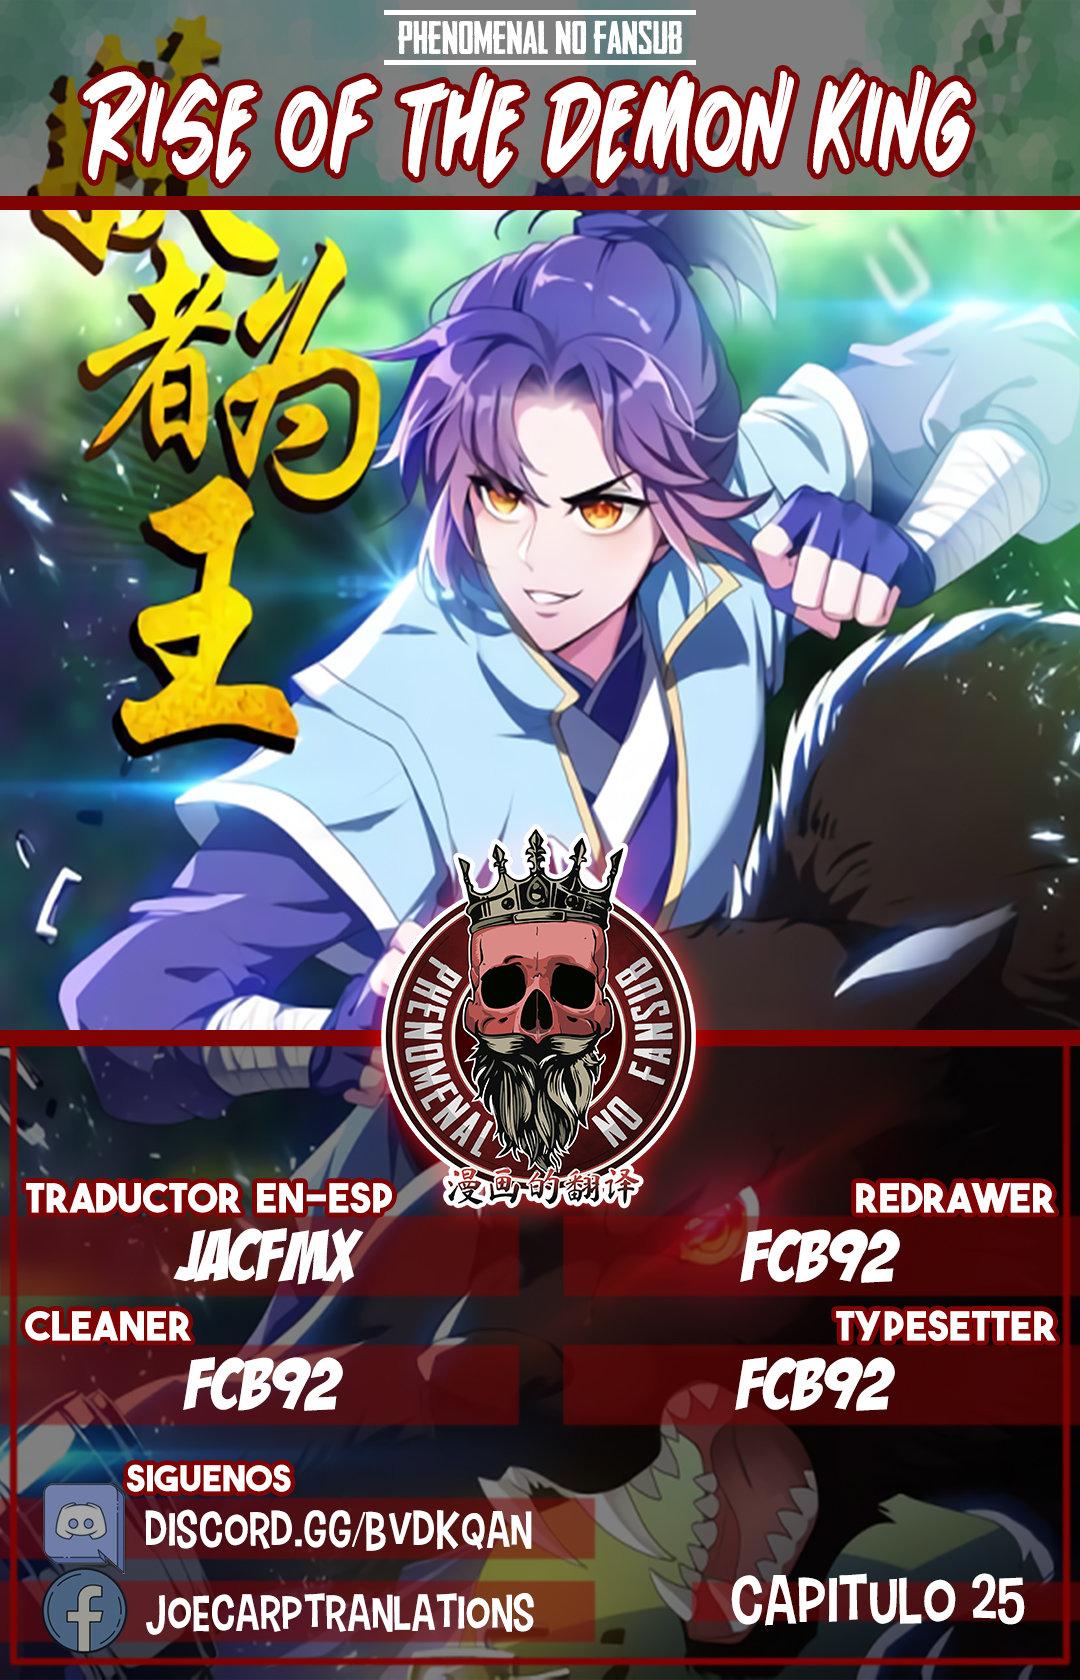 https://nine.mangadogs.com/es_manga/pic8/33/28385/946722/a637c2c00dcc461e84c12ec671e5a06a.jpg Page 1